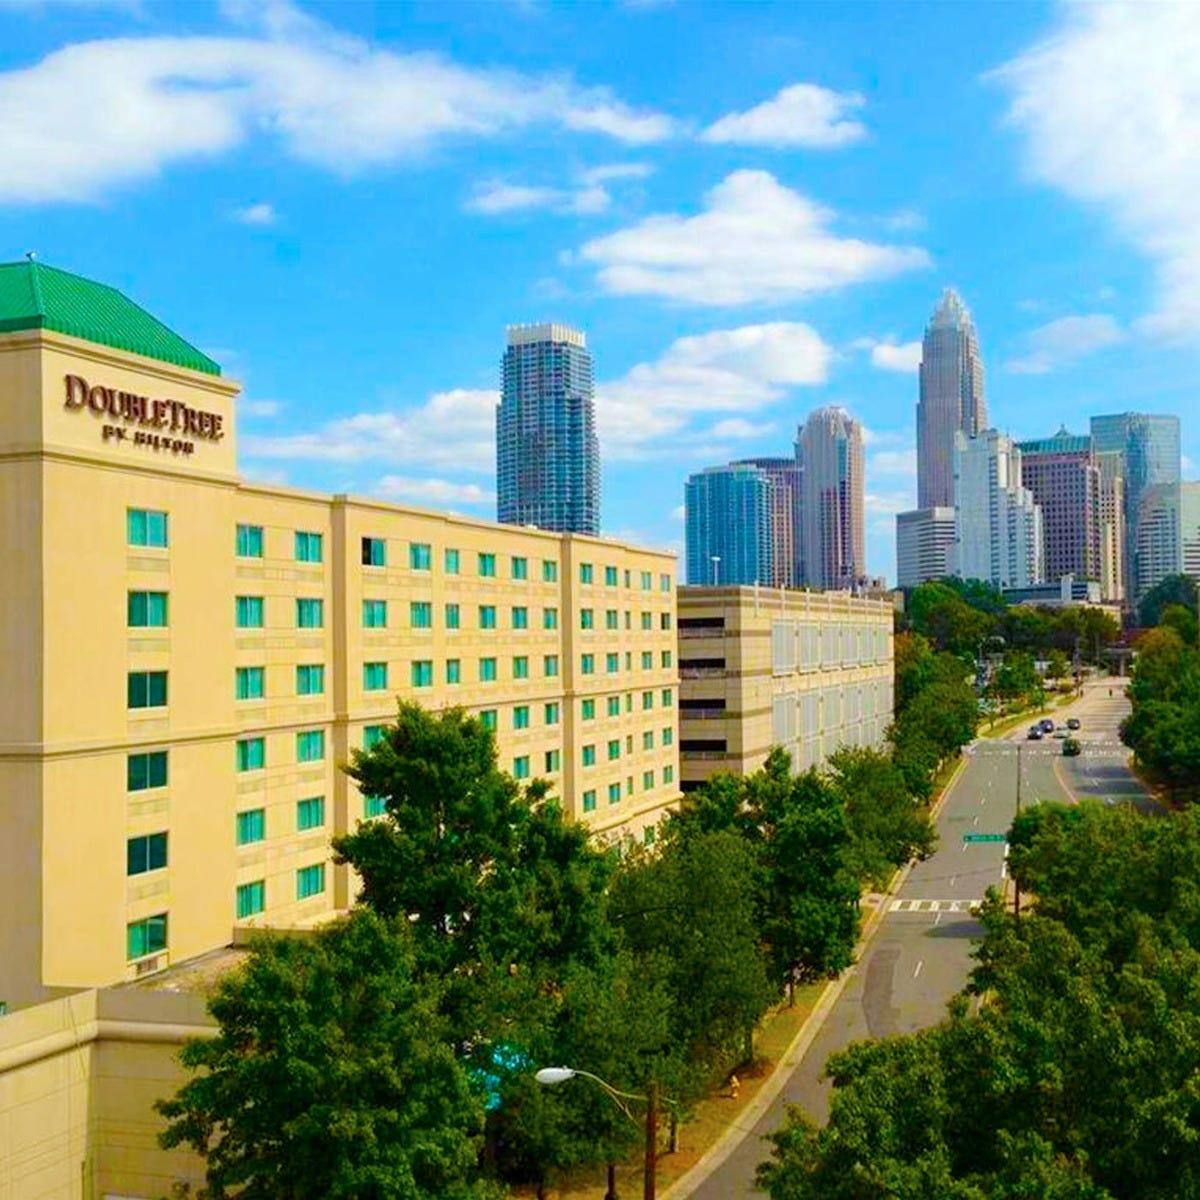 Double Tree by Hilton Charlotte - Charlotte, North Carolina